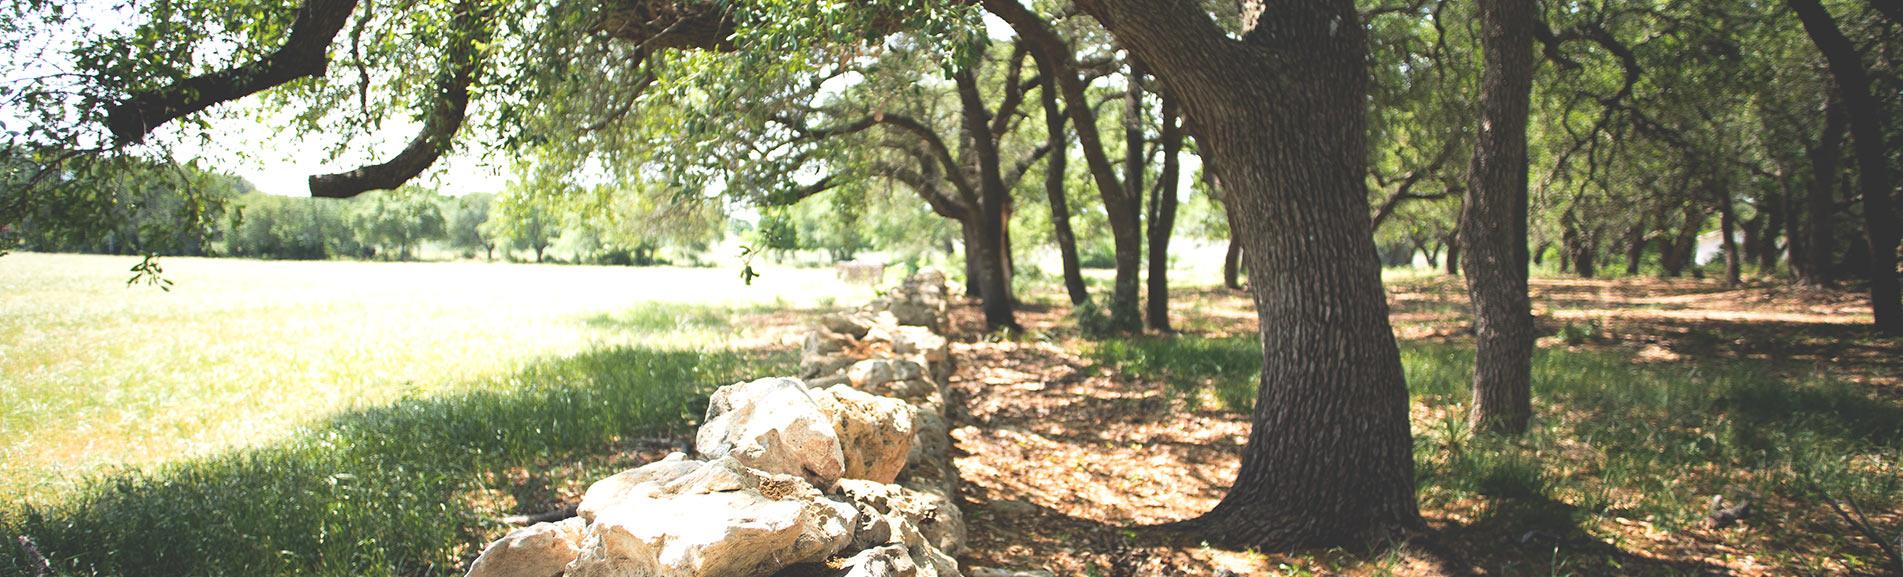 RV Park & Campground Dripping Springs, TX | Motorhome Park